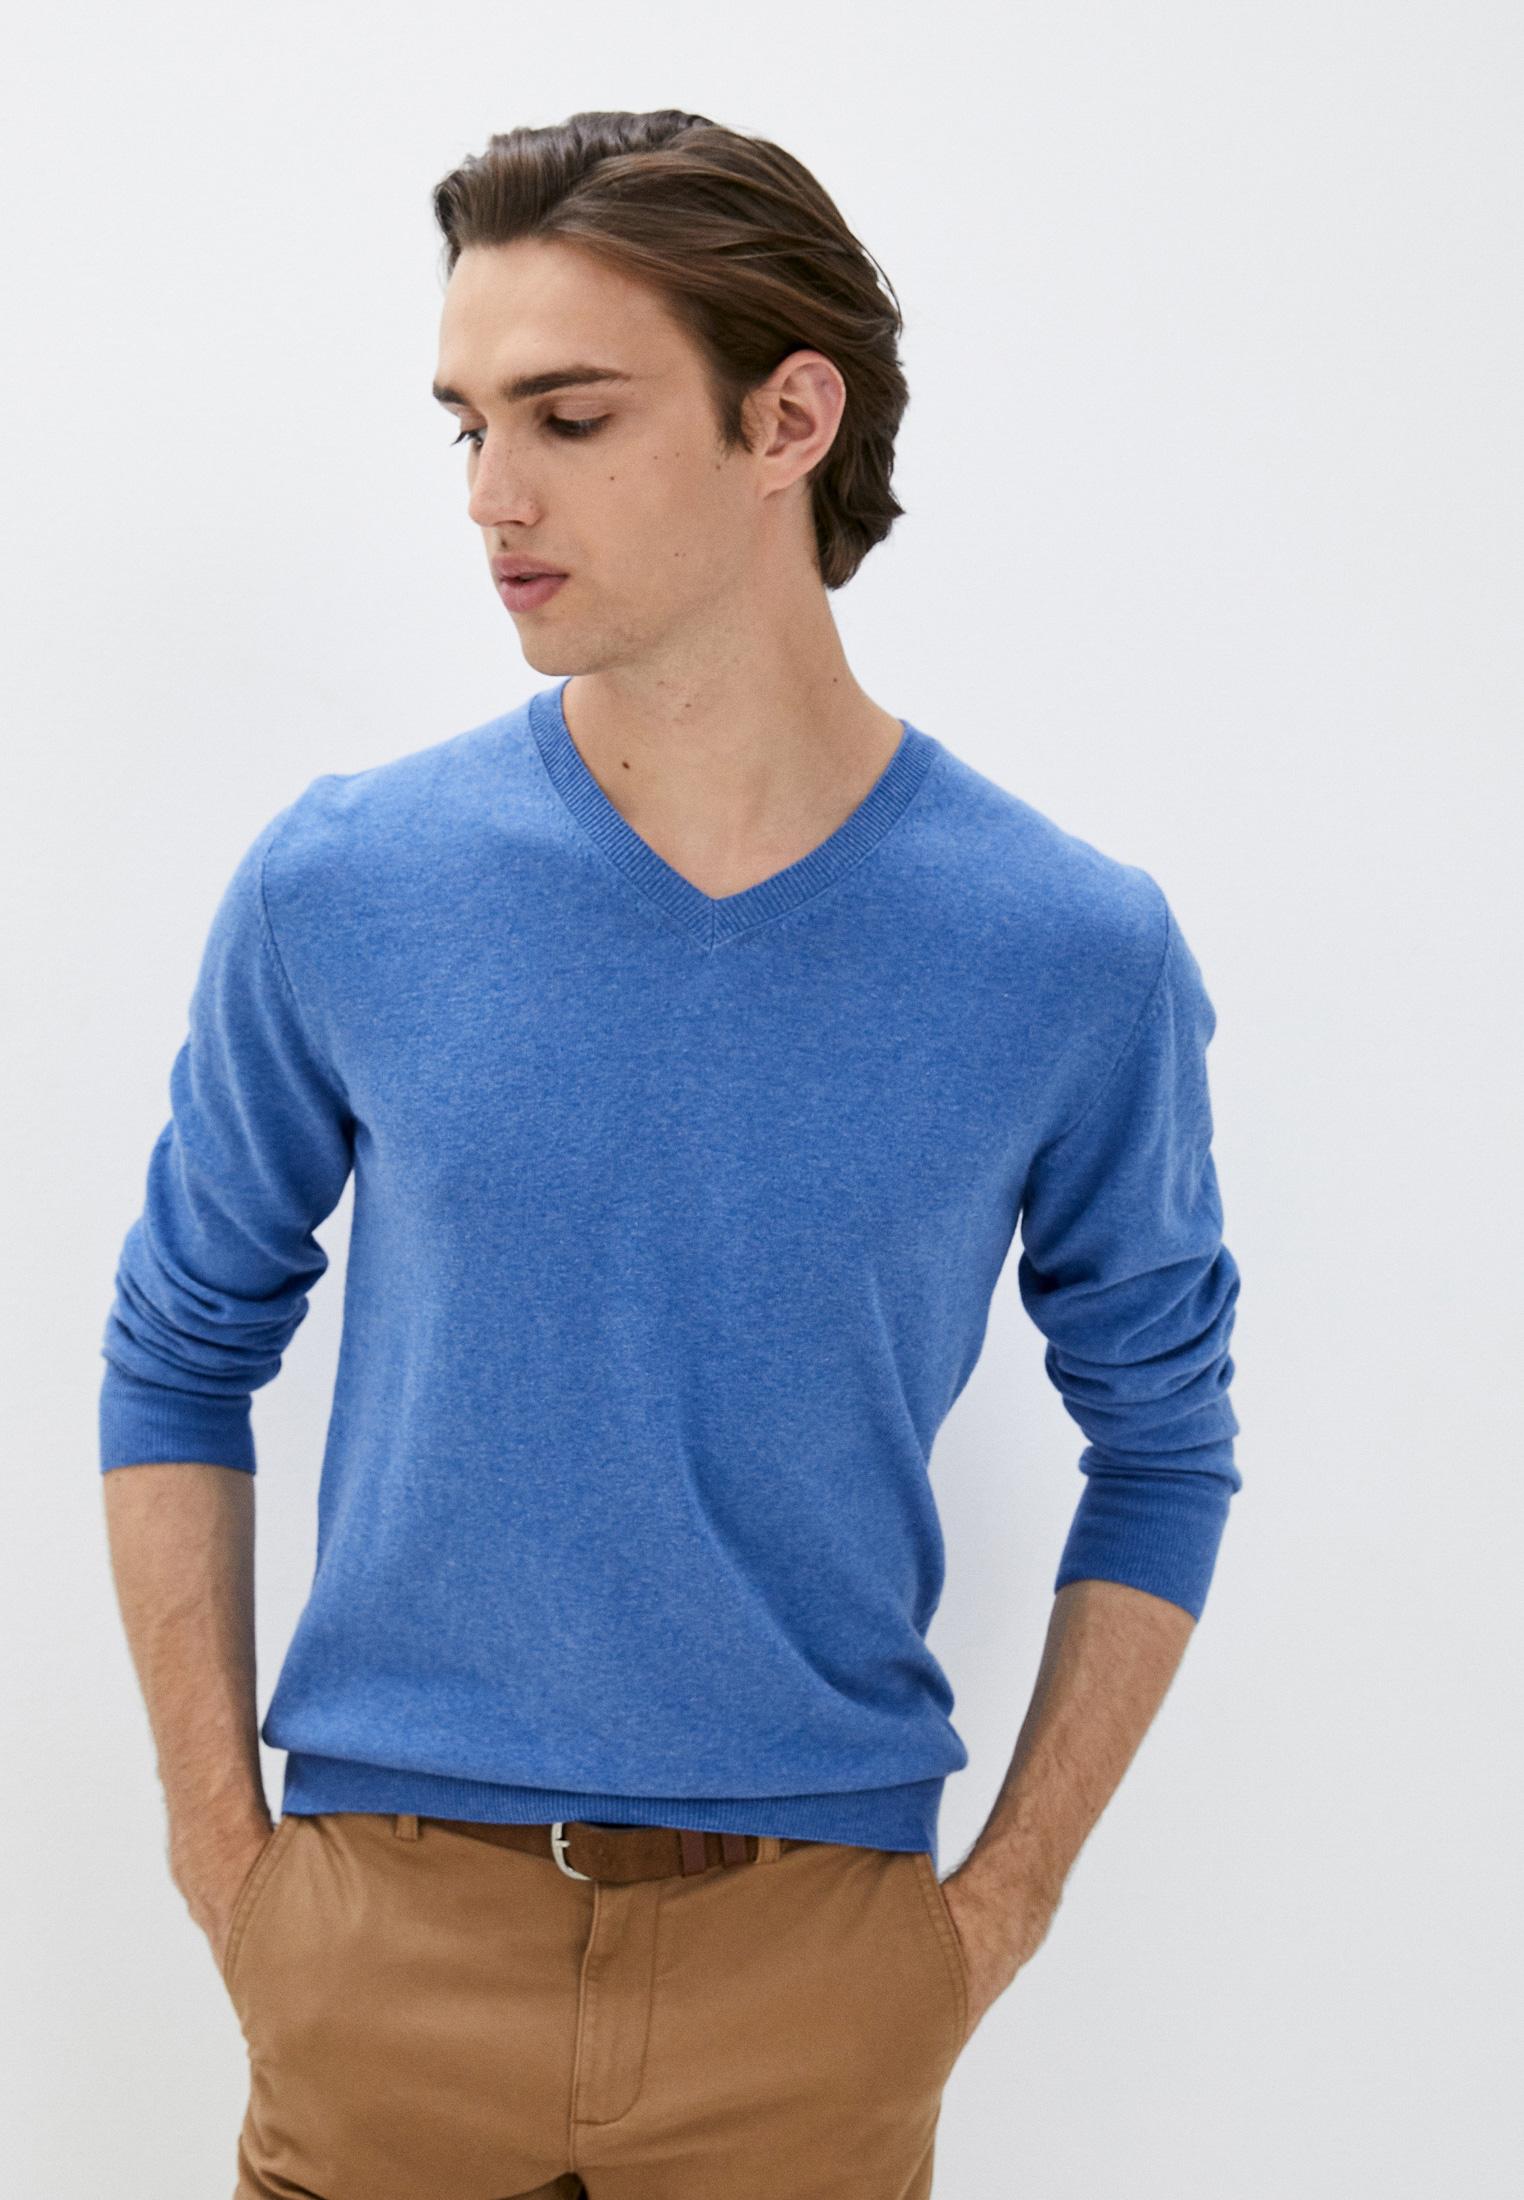 Пуловер Basics & More Пуловер Basics & More